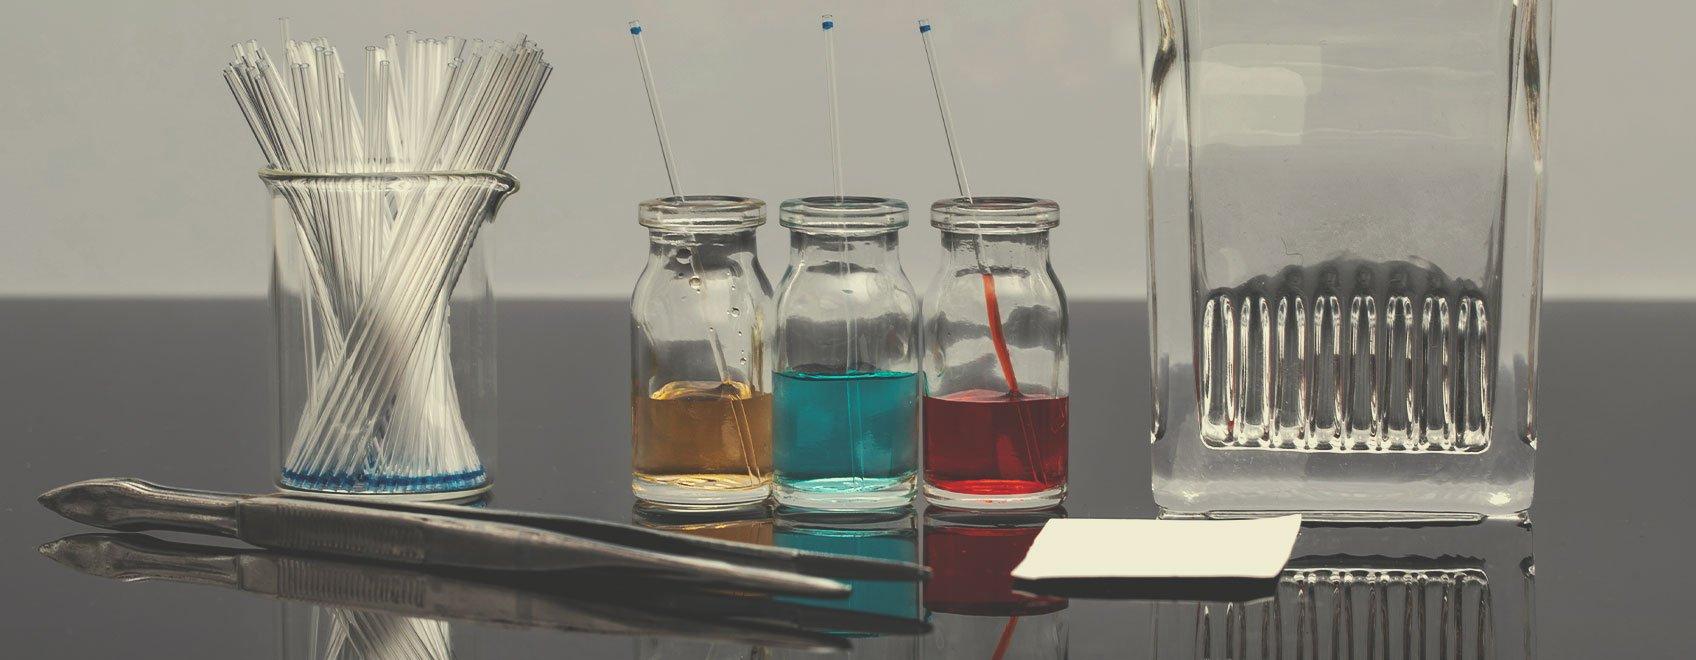 Thin-Layer Chromatography (TLC) Test Kits